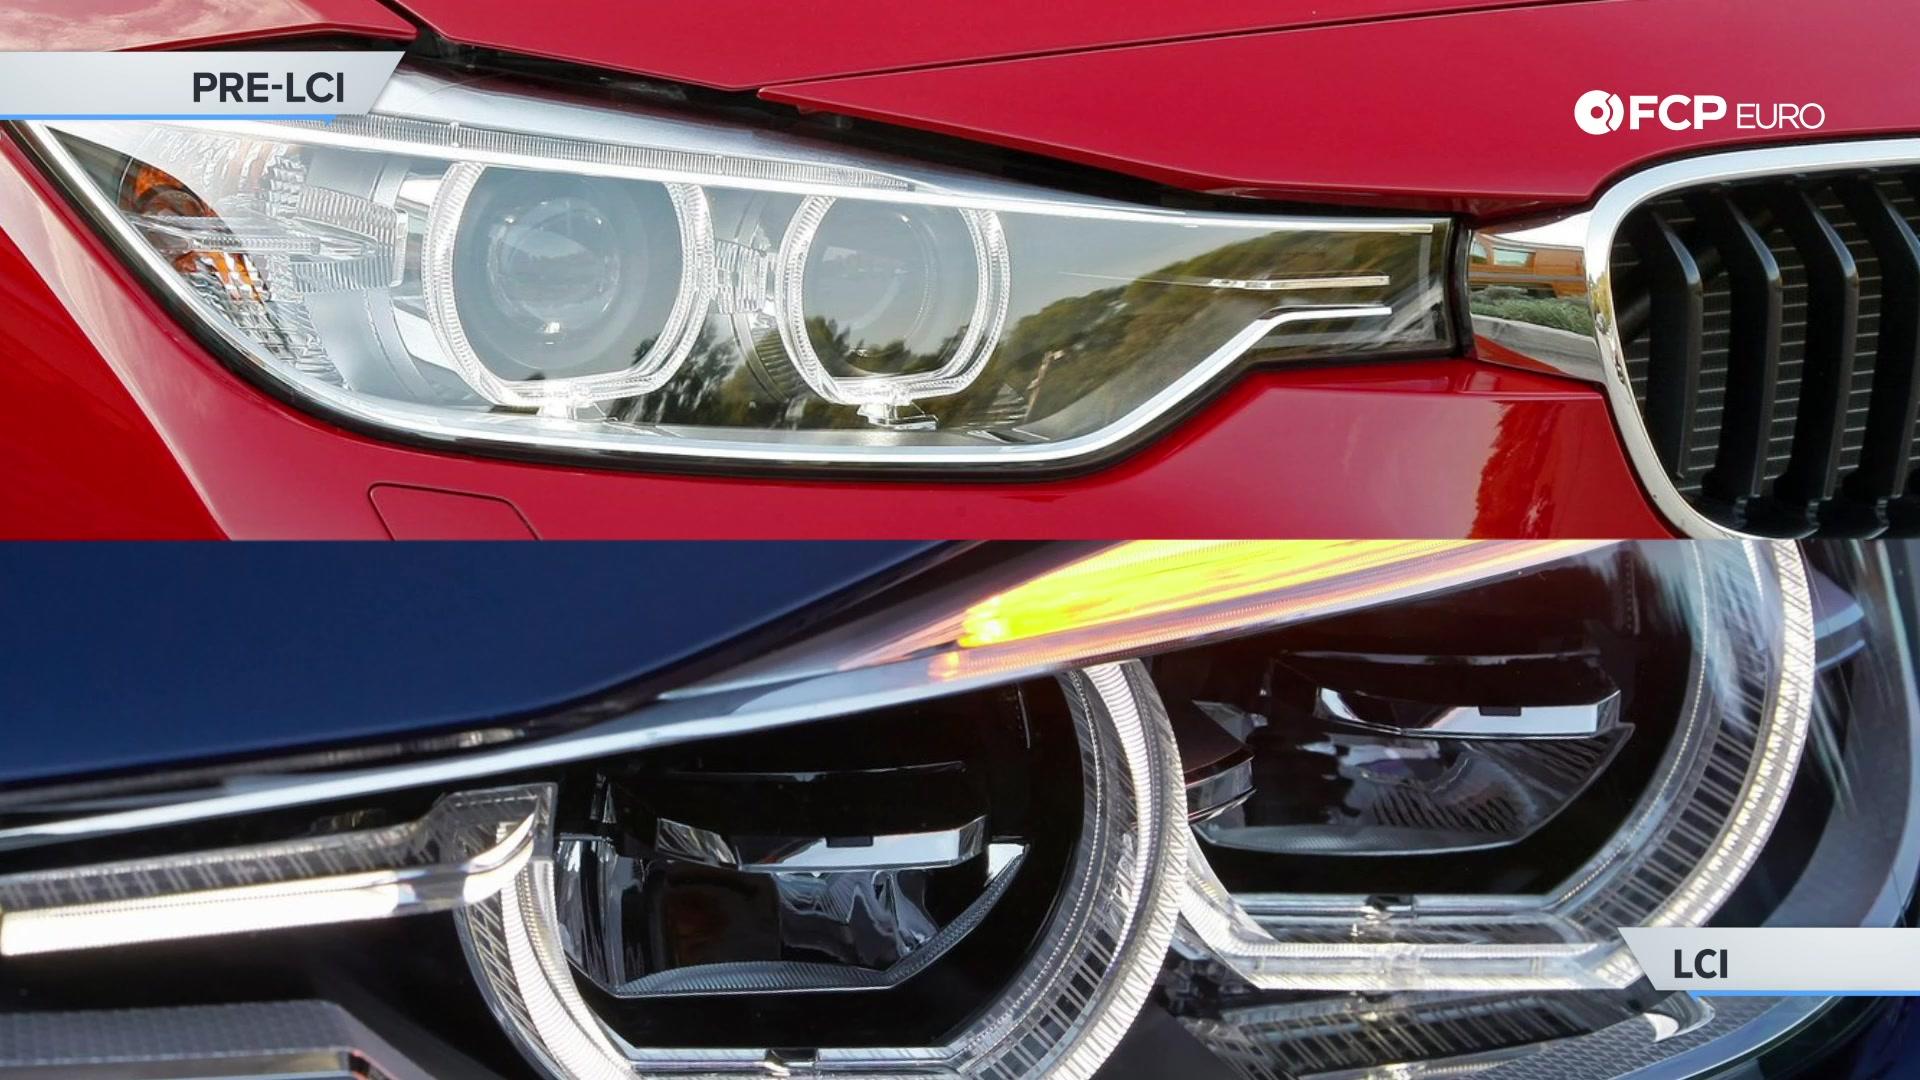 EVERGREEN BMW E90 VS F30 LCI headlight differences